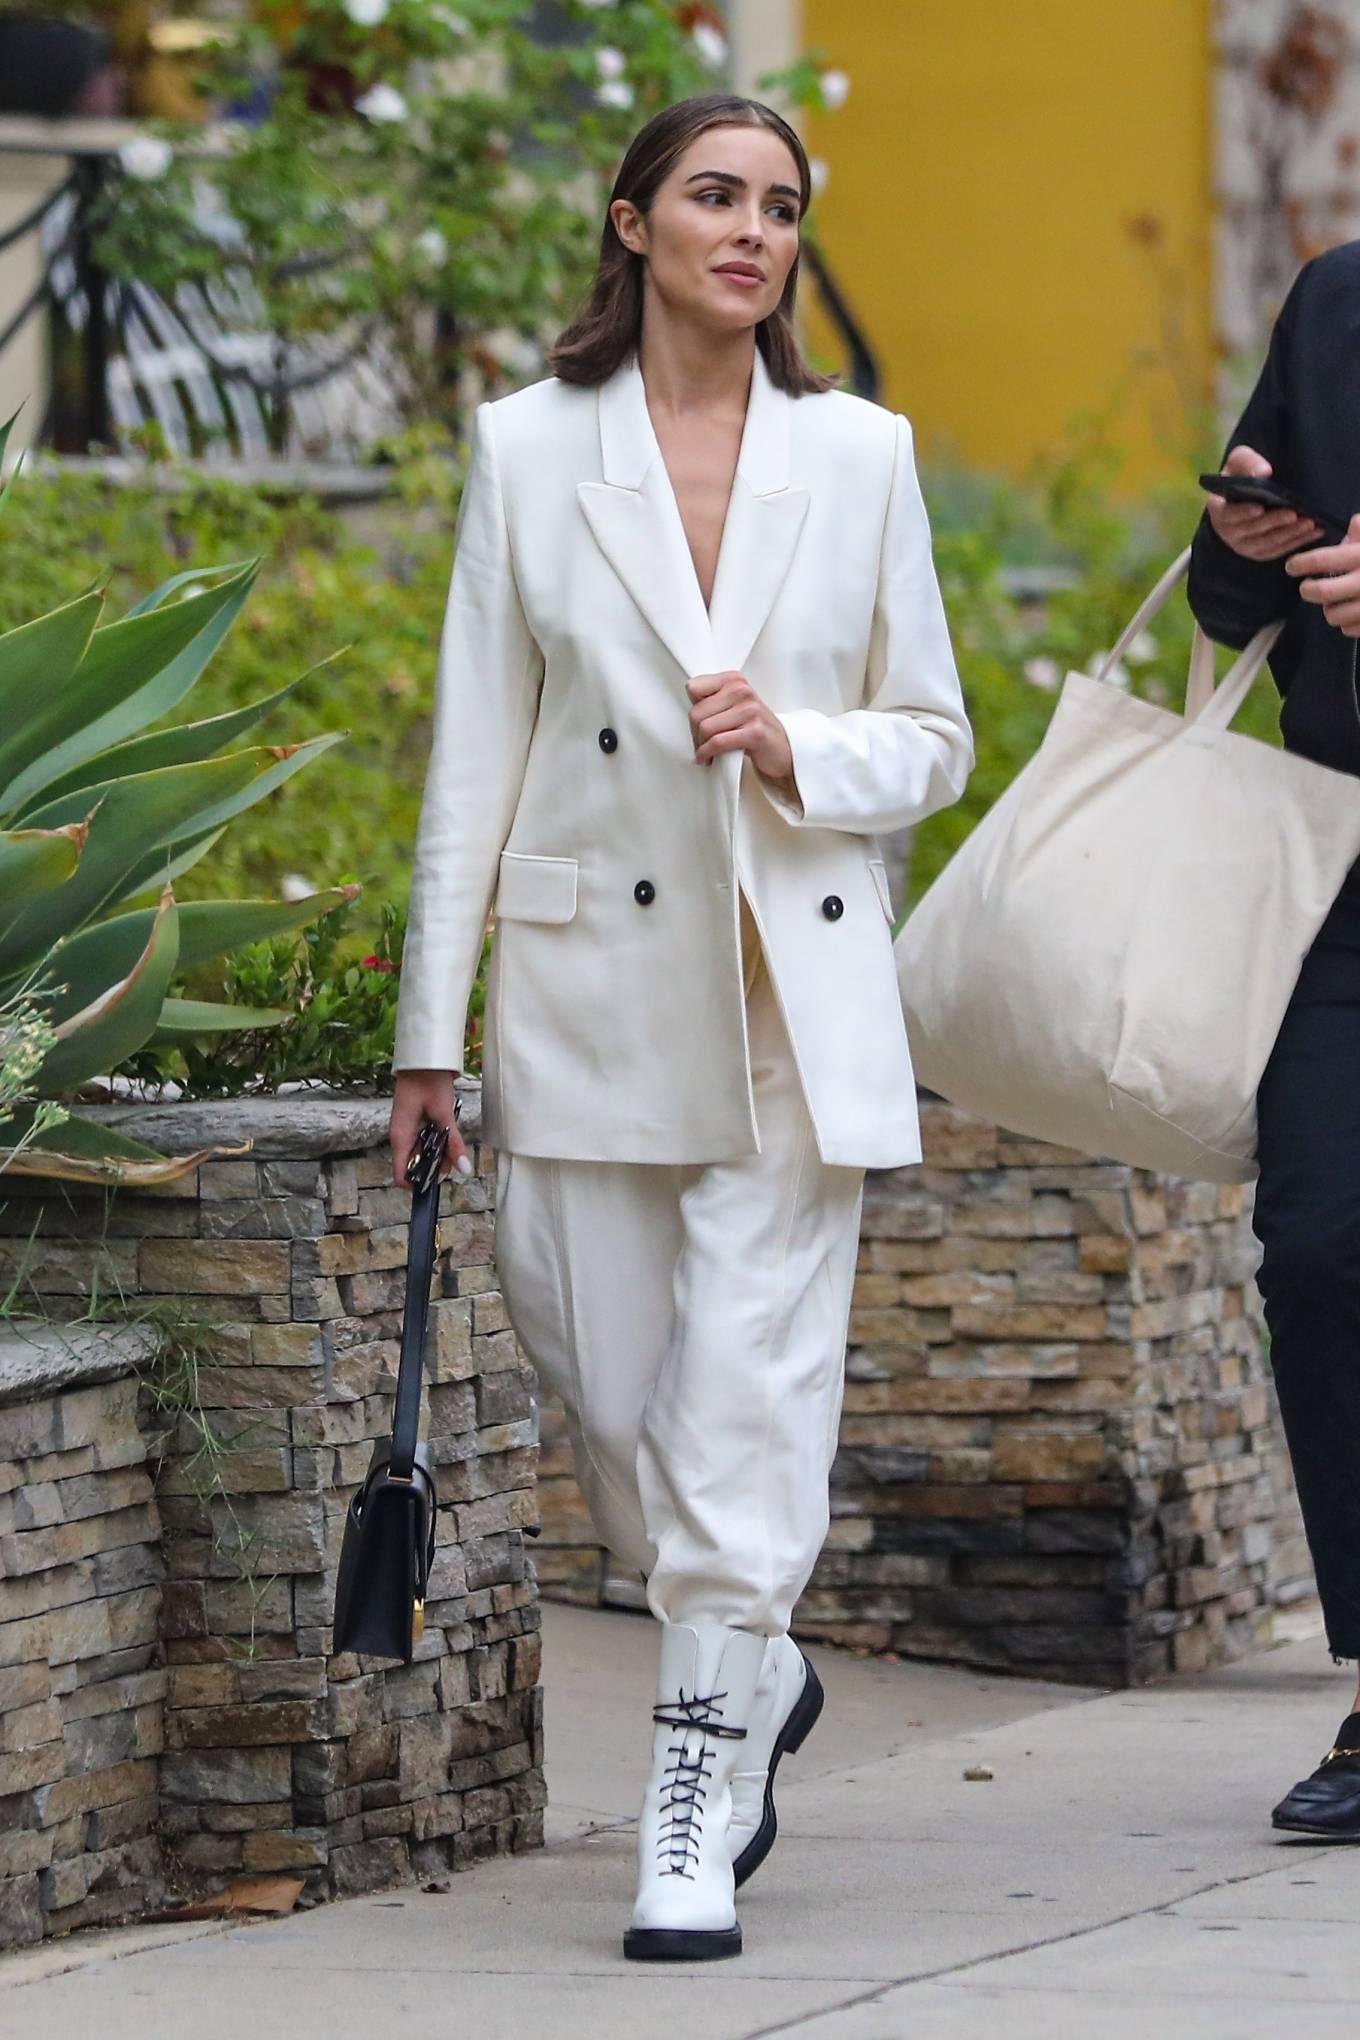 Olivia Culpo wearing cream trousers